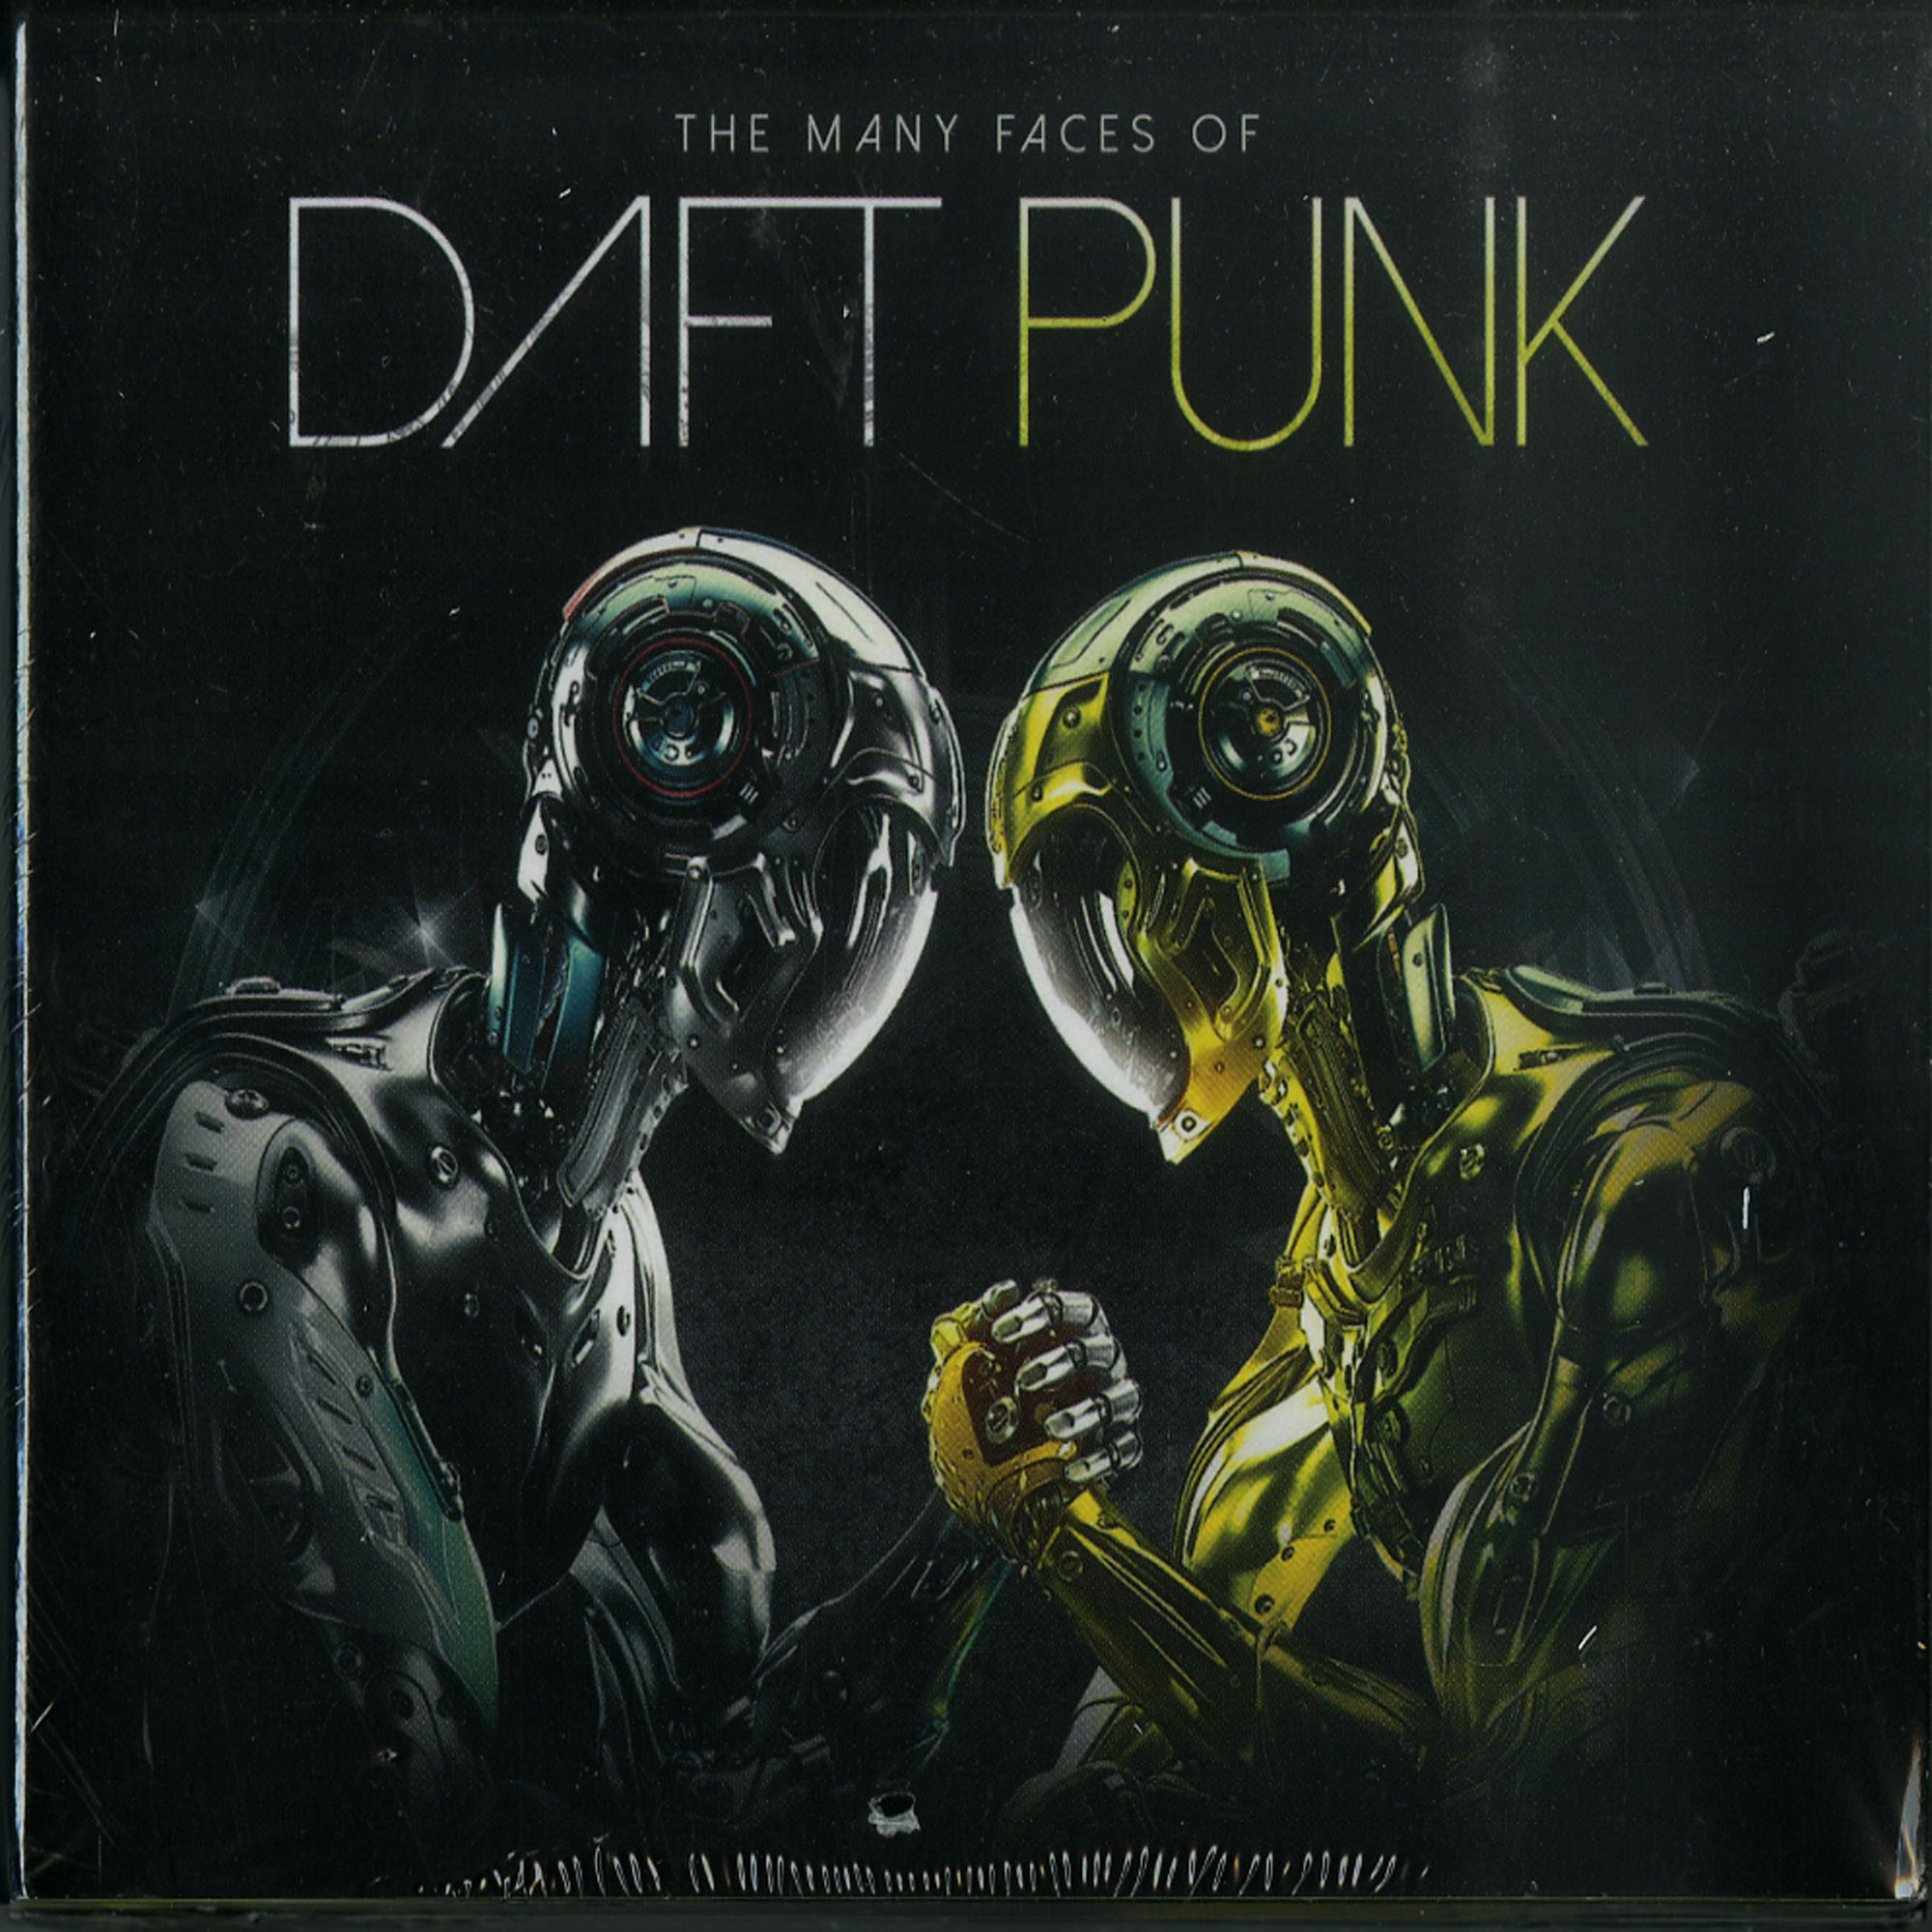 Daft Punk - THE MANY FACES OF DAFT PUNK